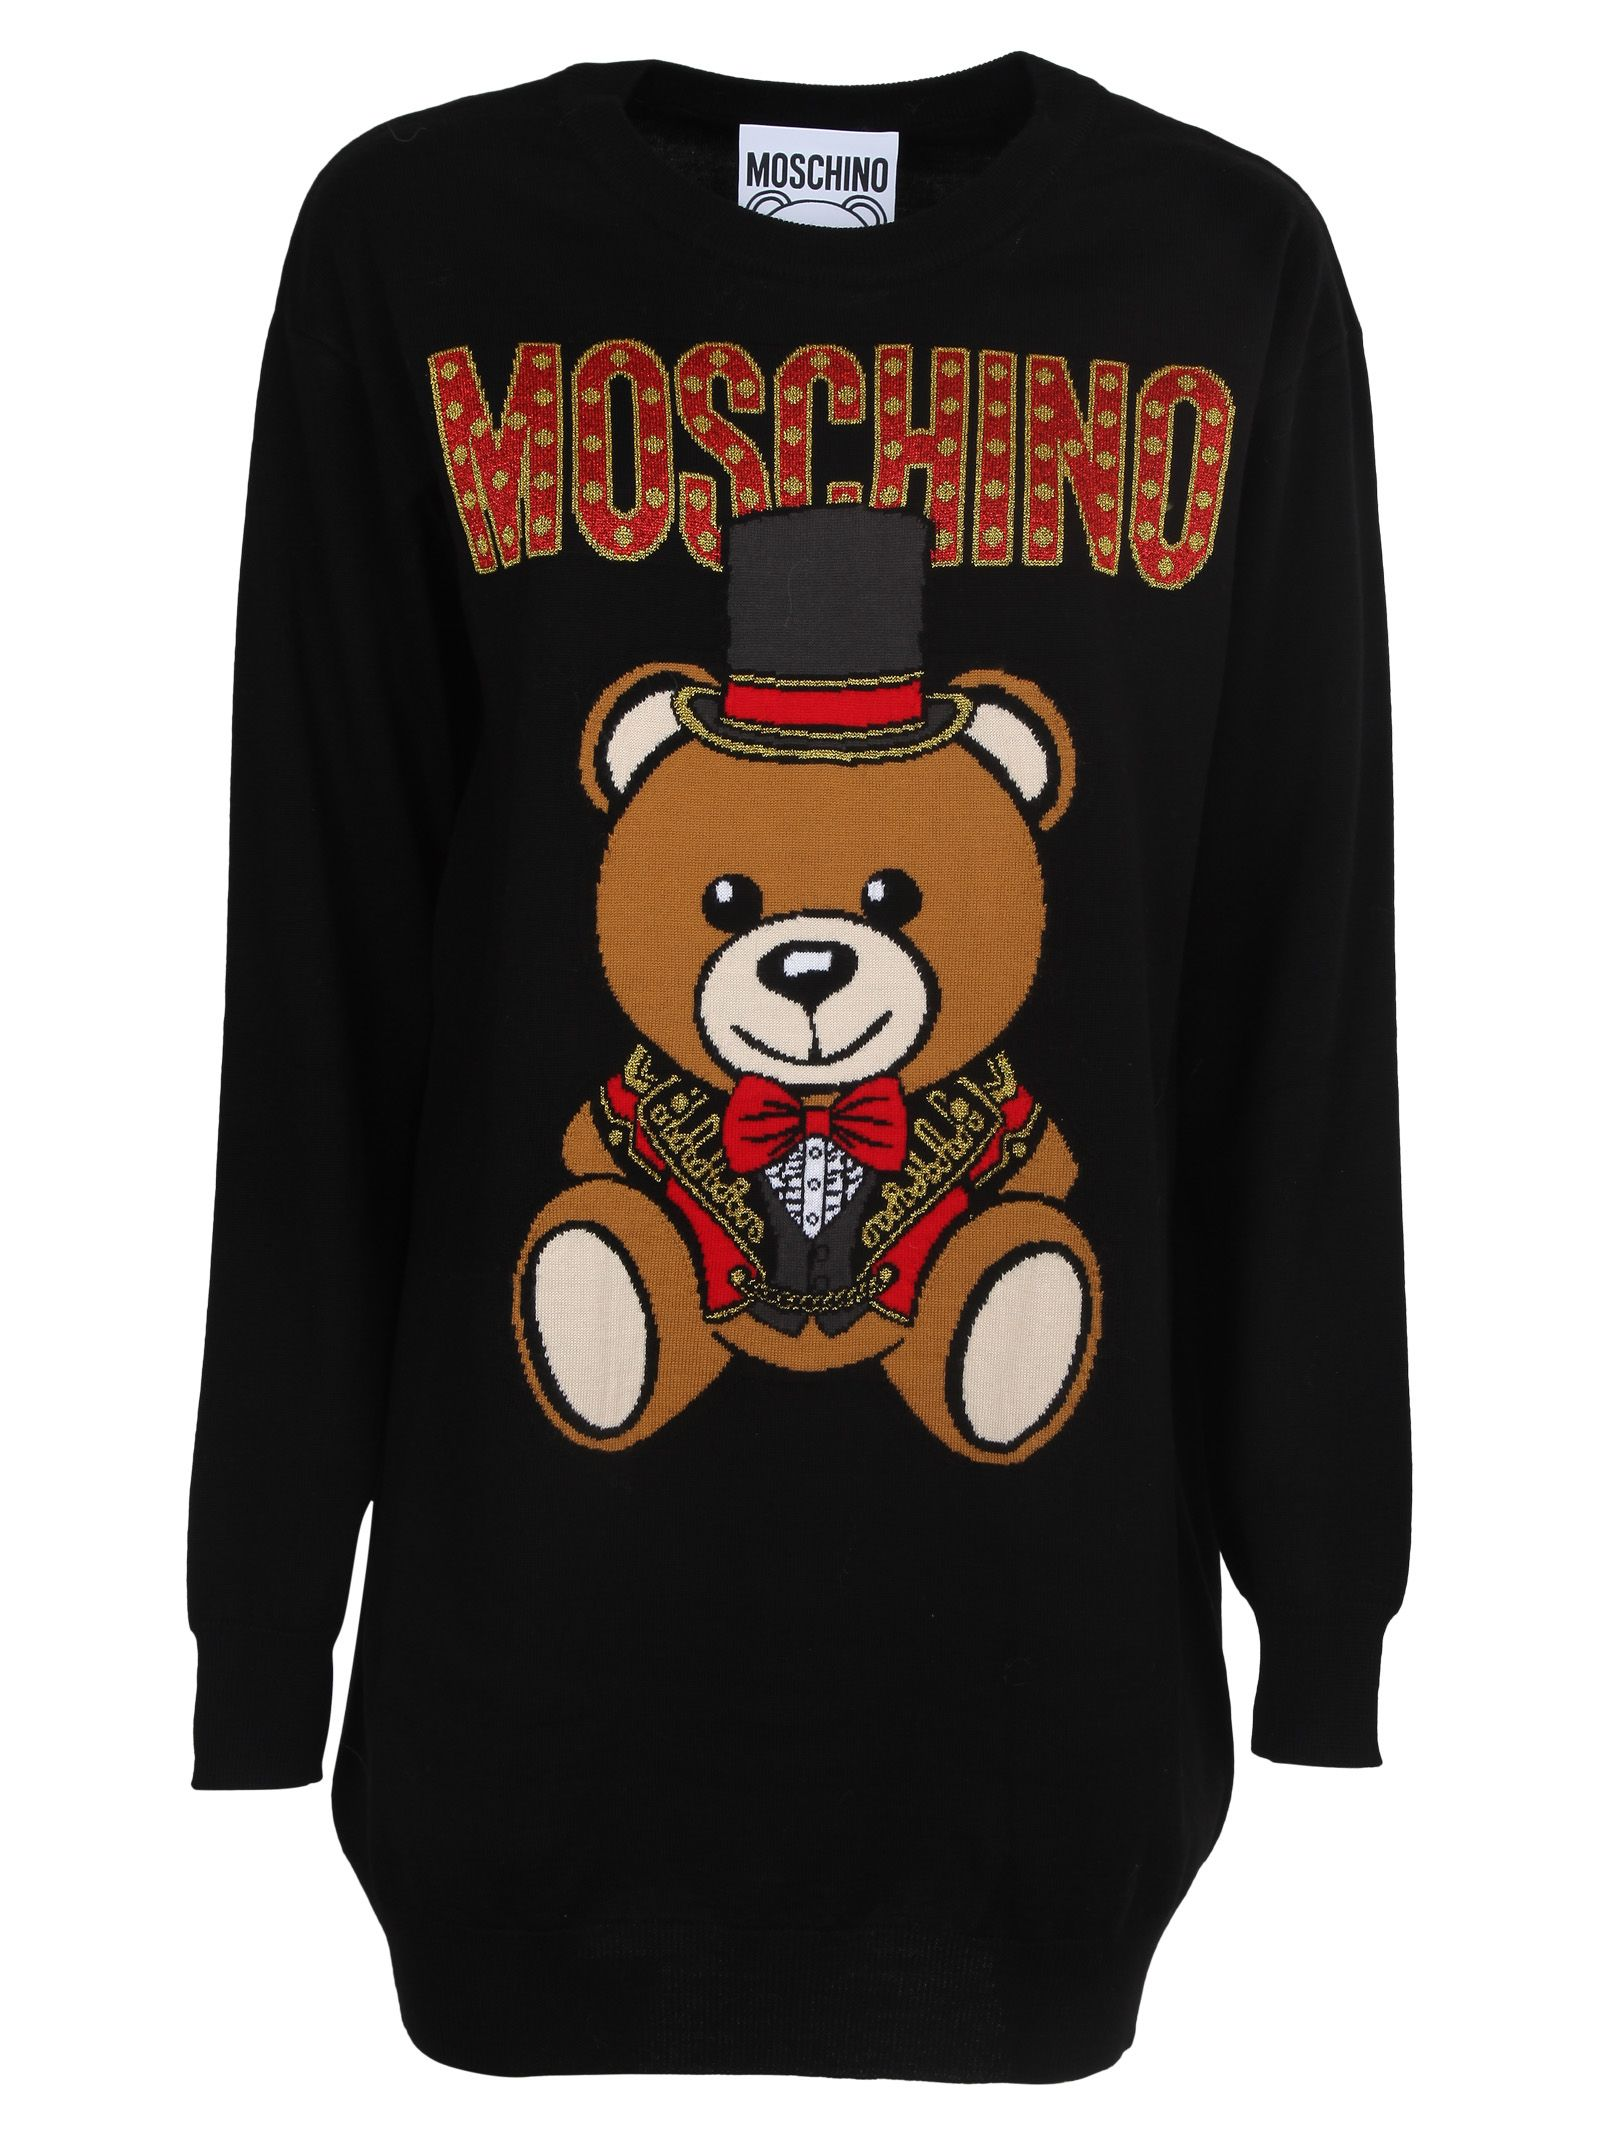 Moschino Teddy Bear Knit Sweater Dress